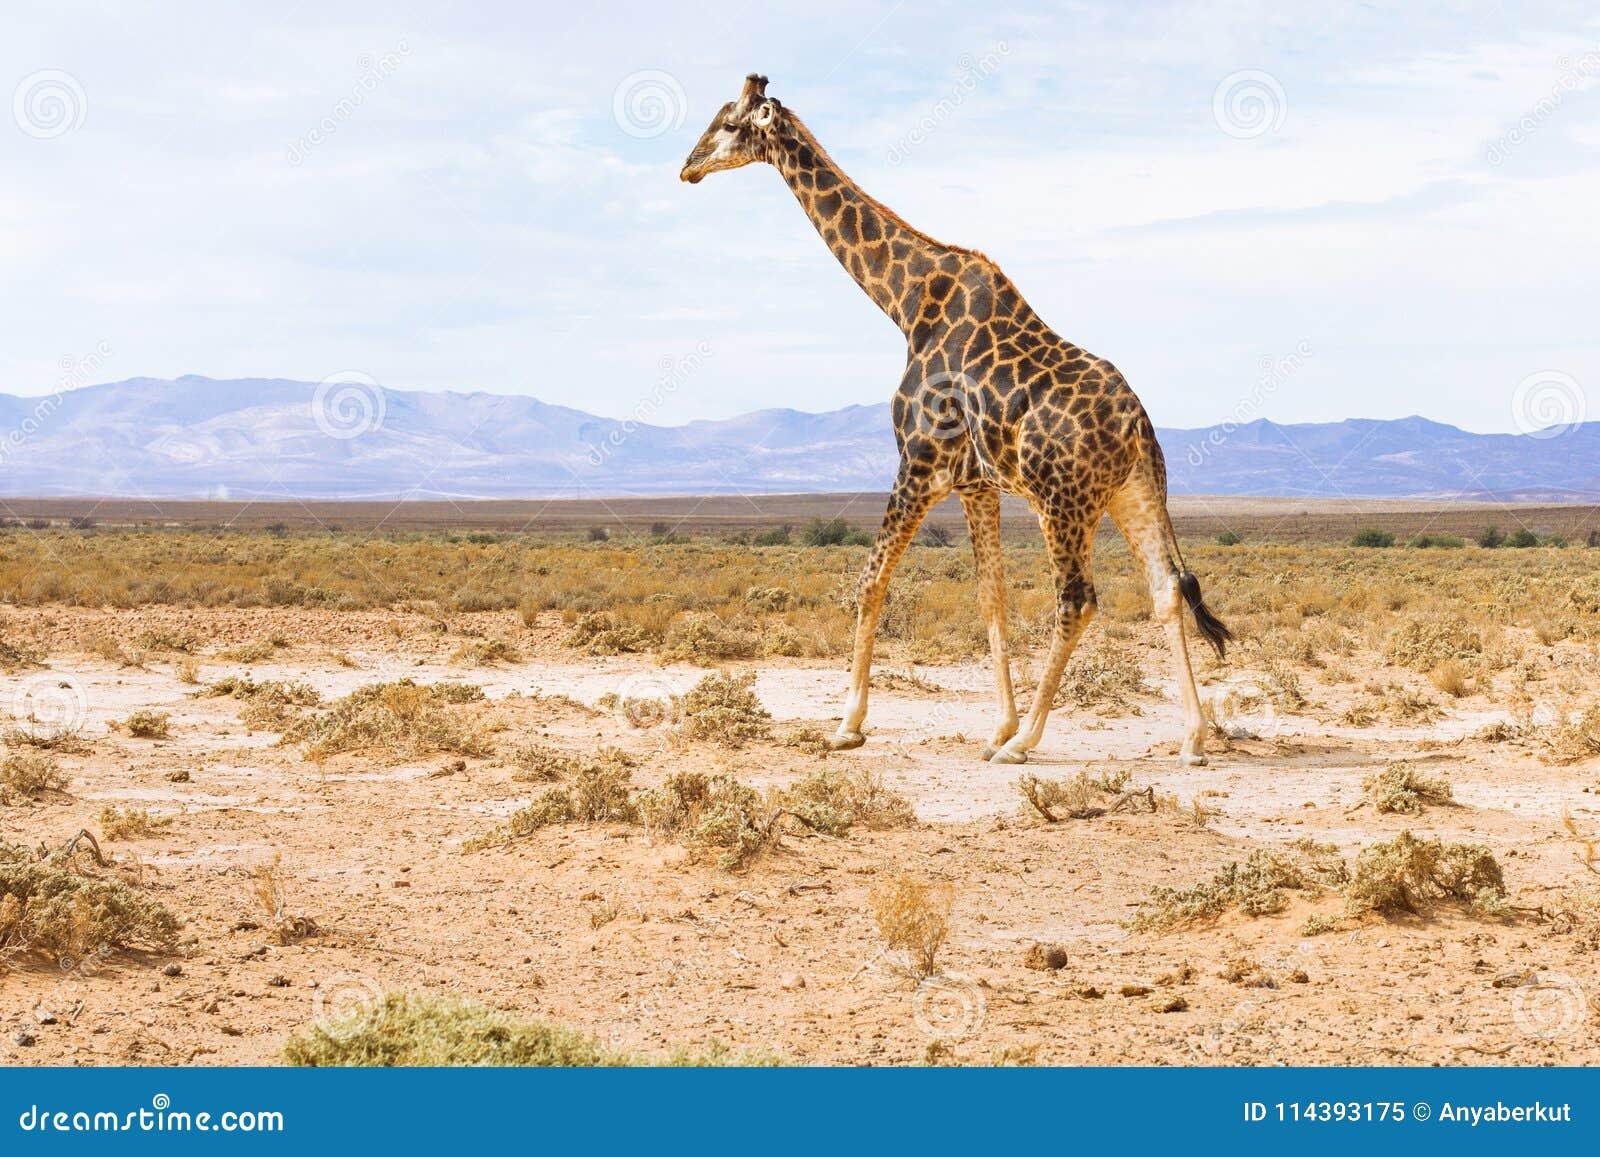 Jirafa en el paisaje de Suráfrica, safari de la fauna